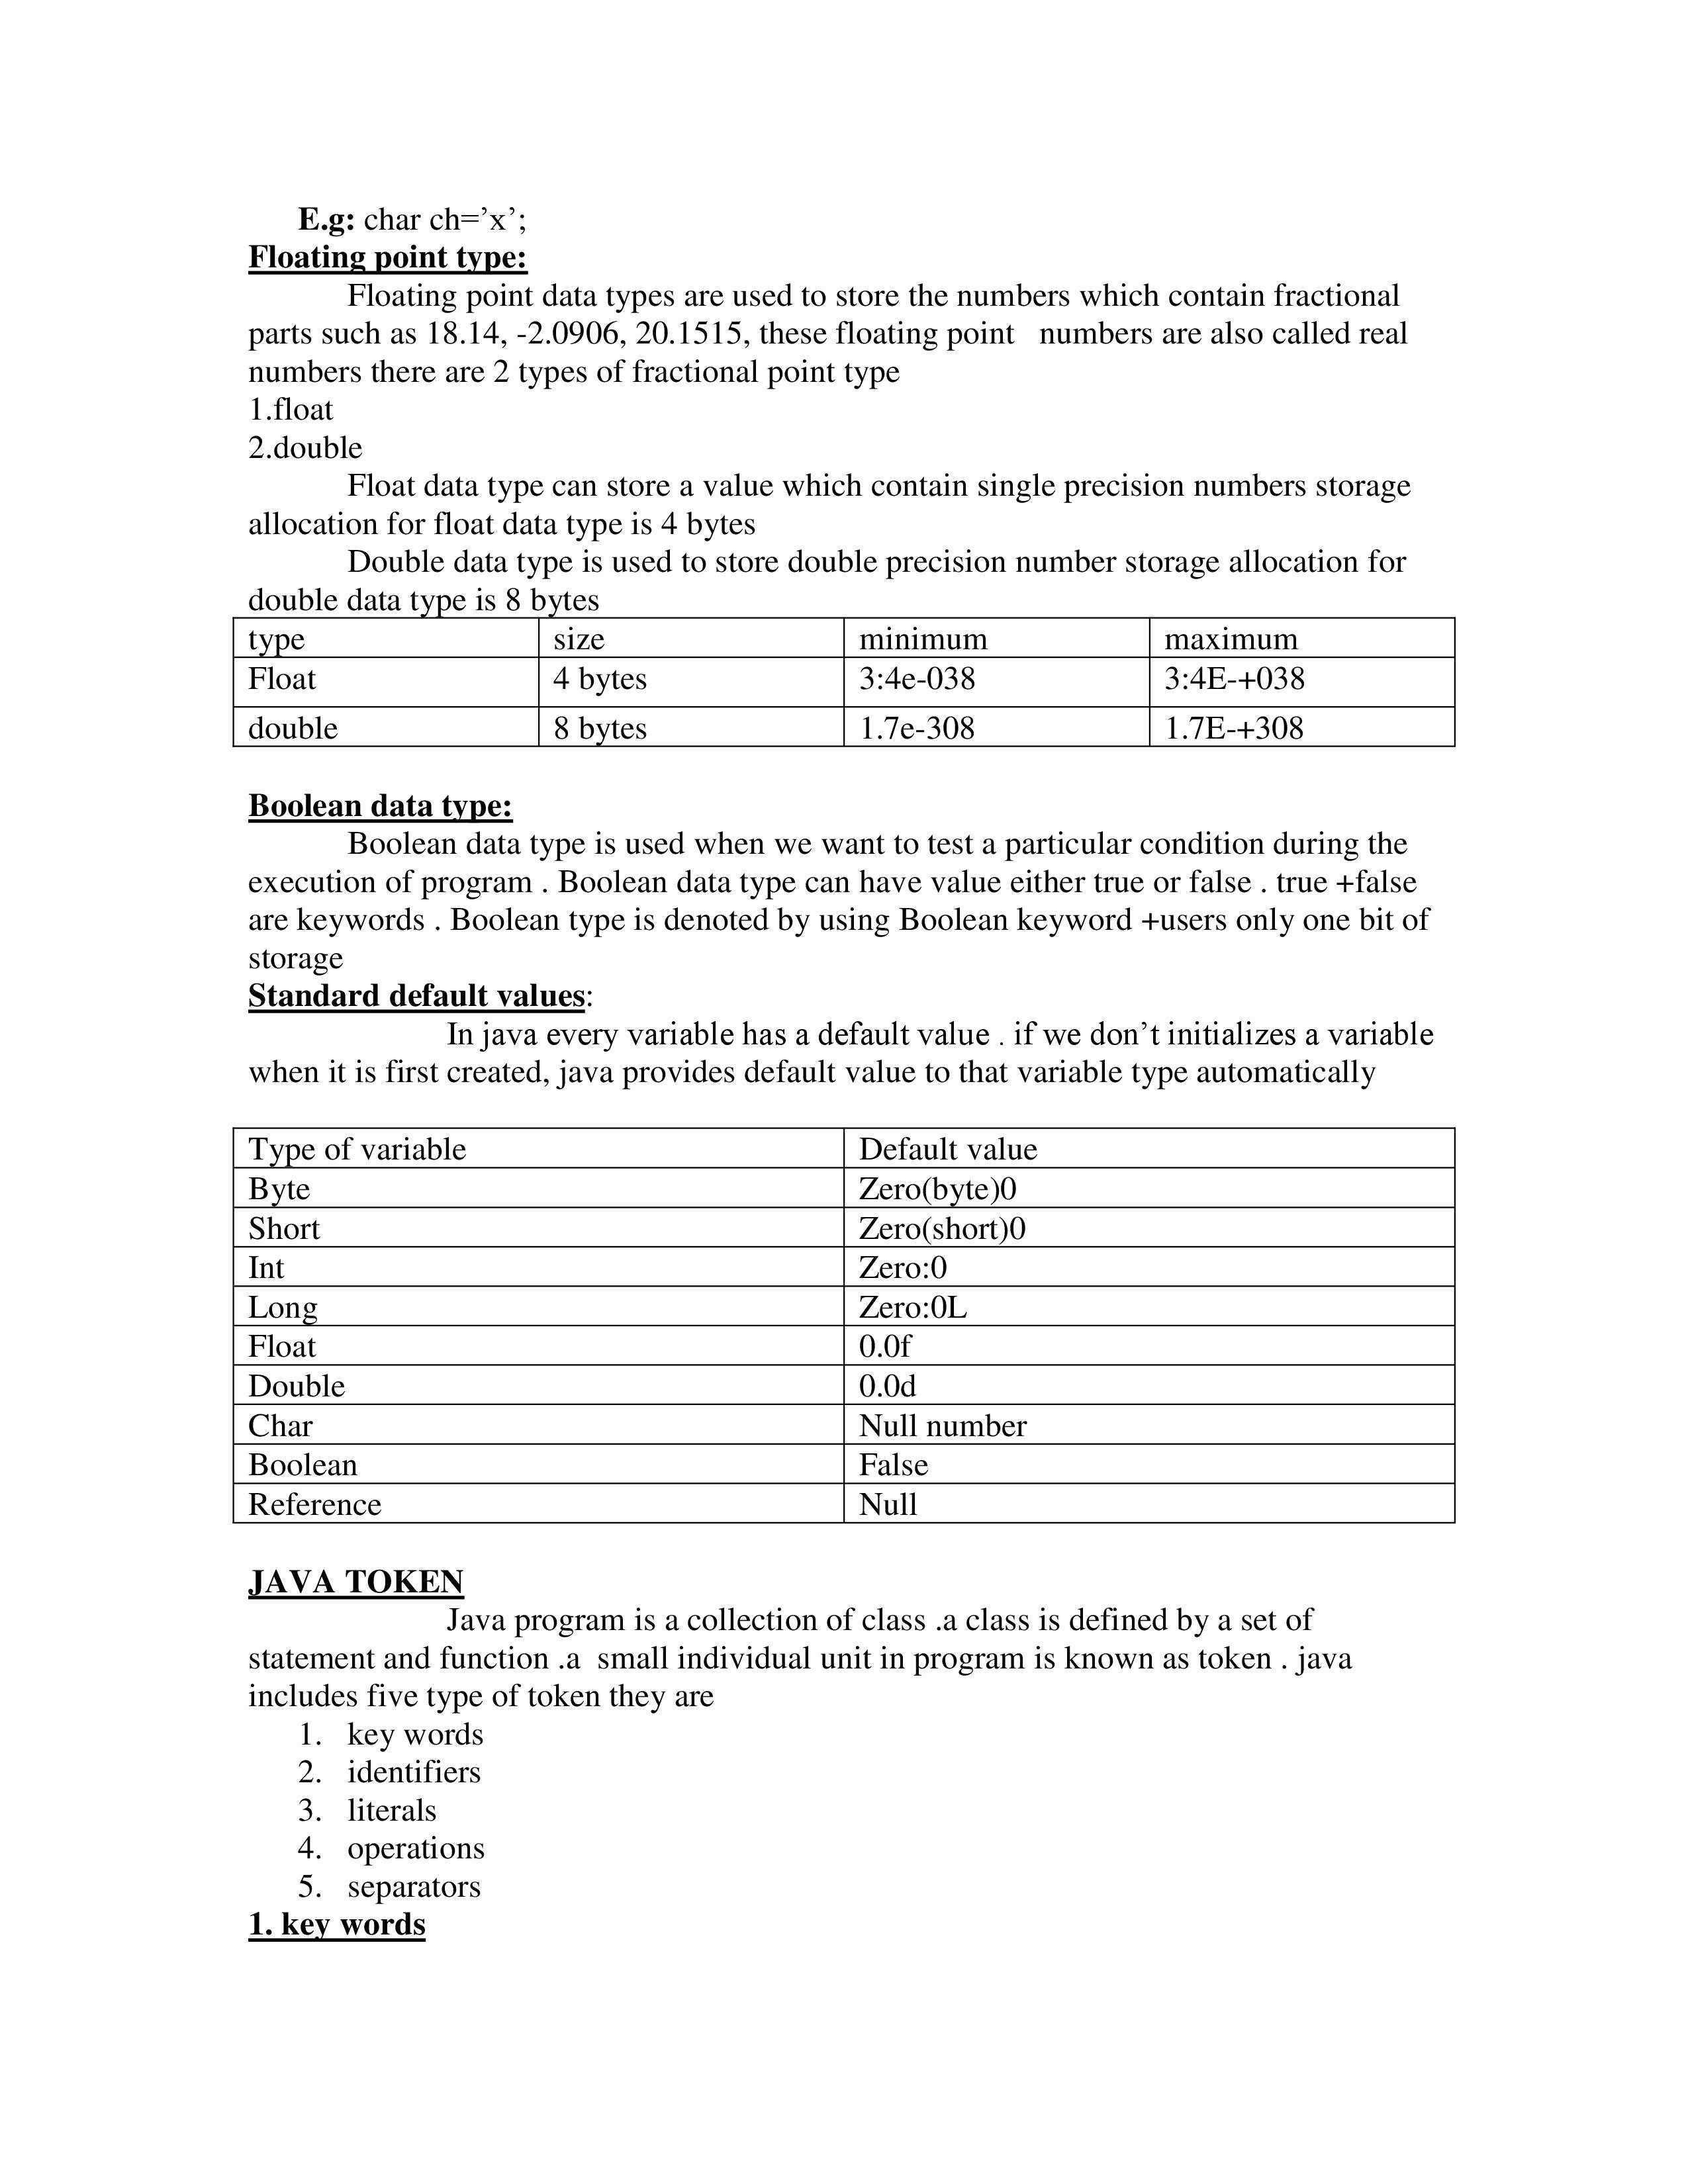 Powerflex 4 Parameter Spreadsheet For Powerflex 4 Parameter Spreadsheet – Spreadsheet Collections